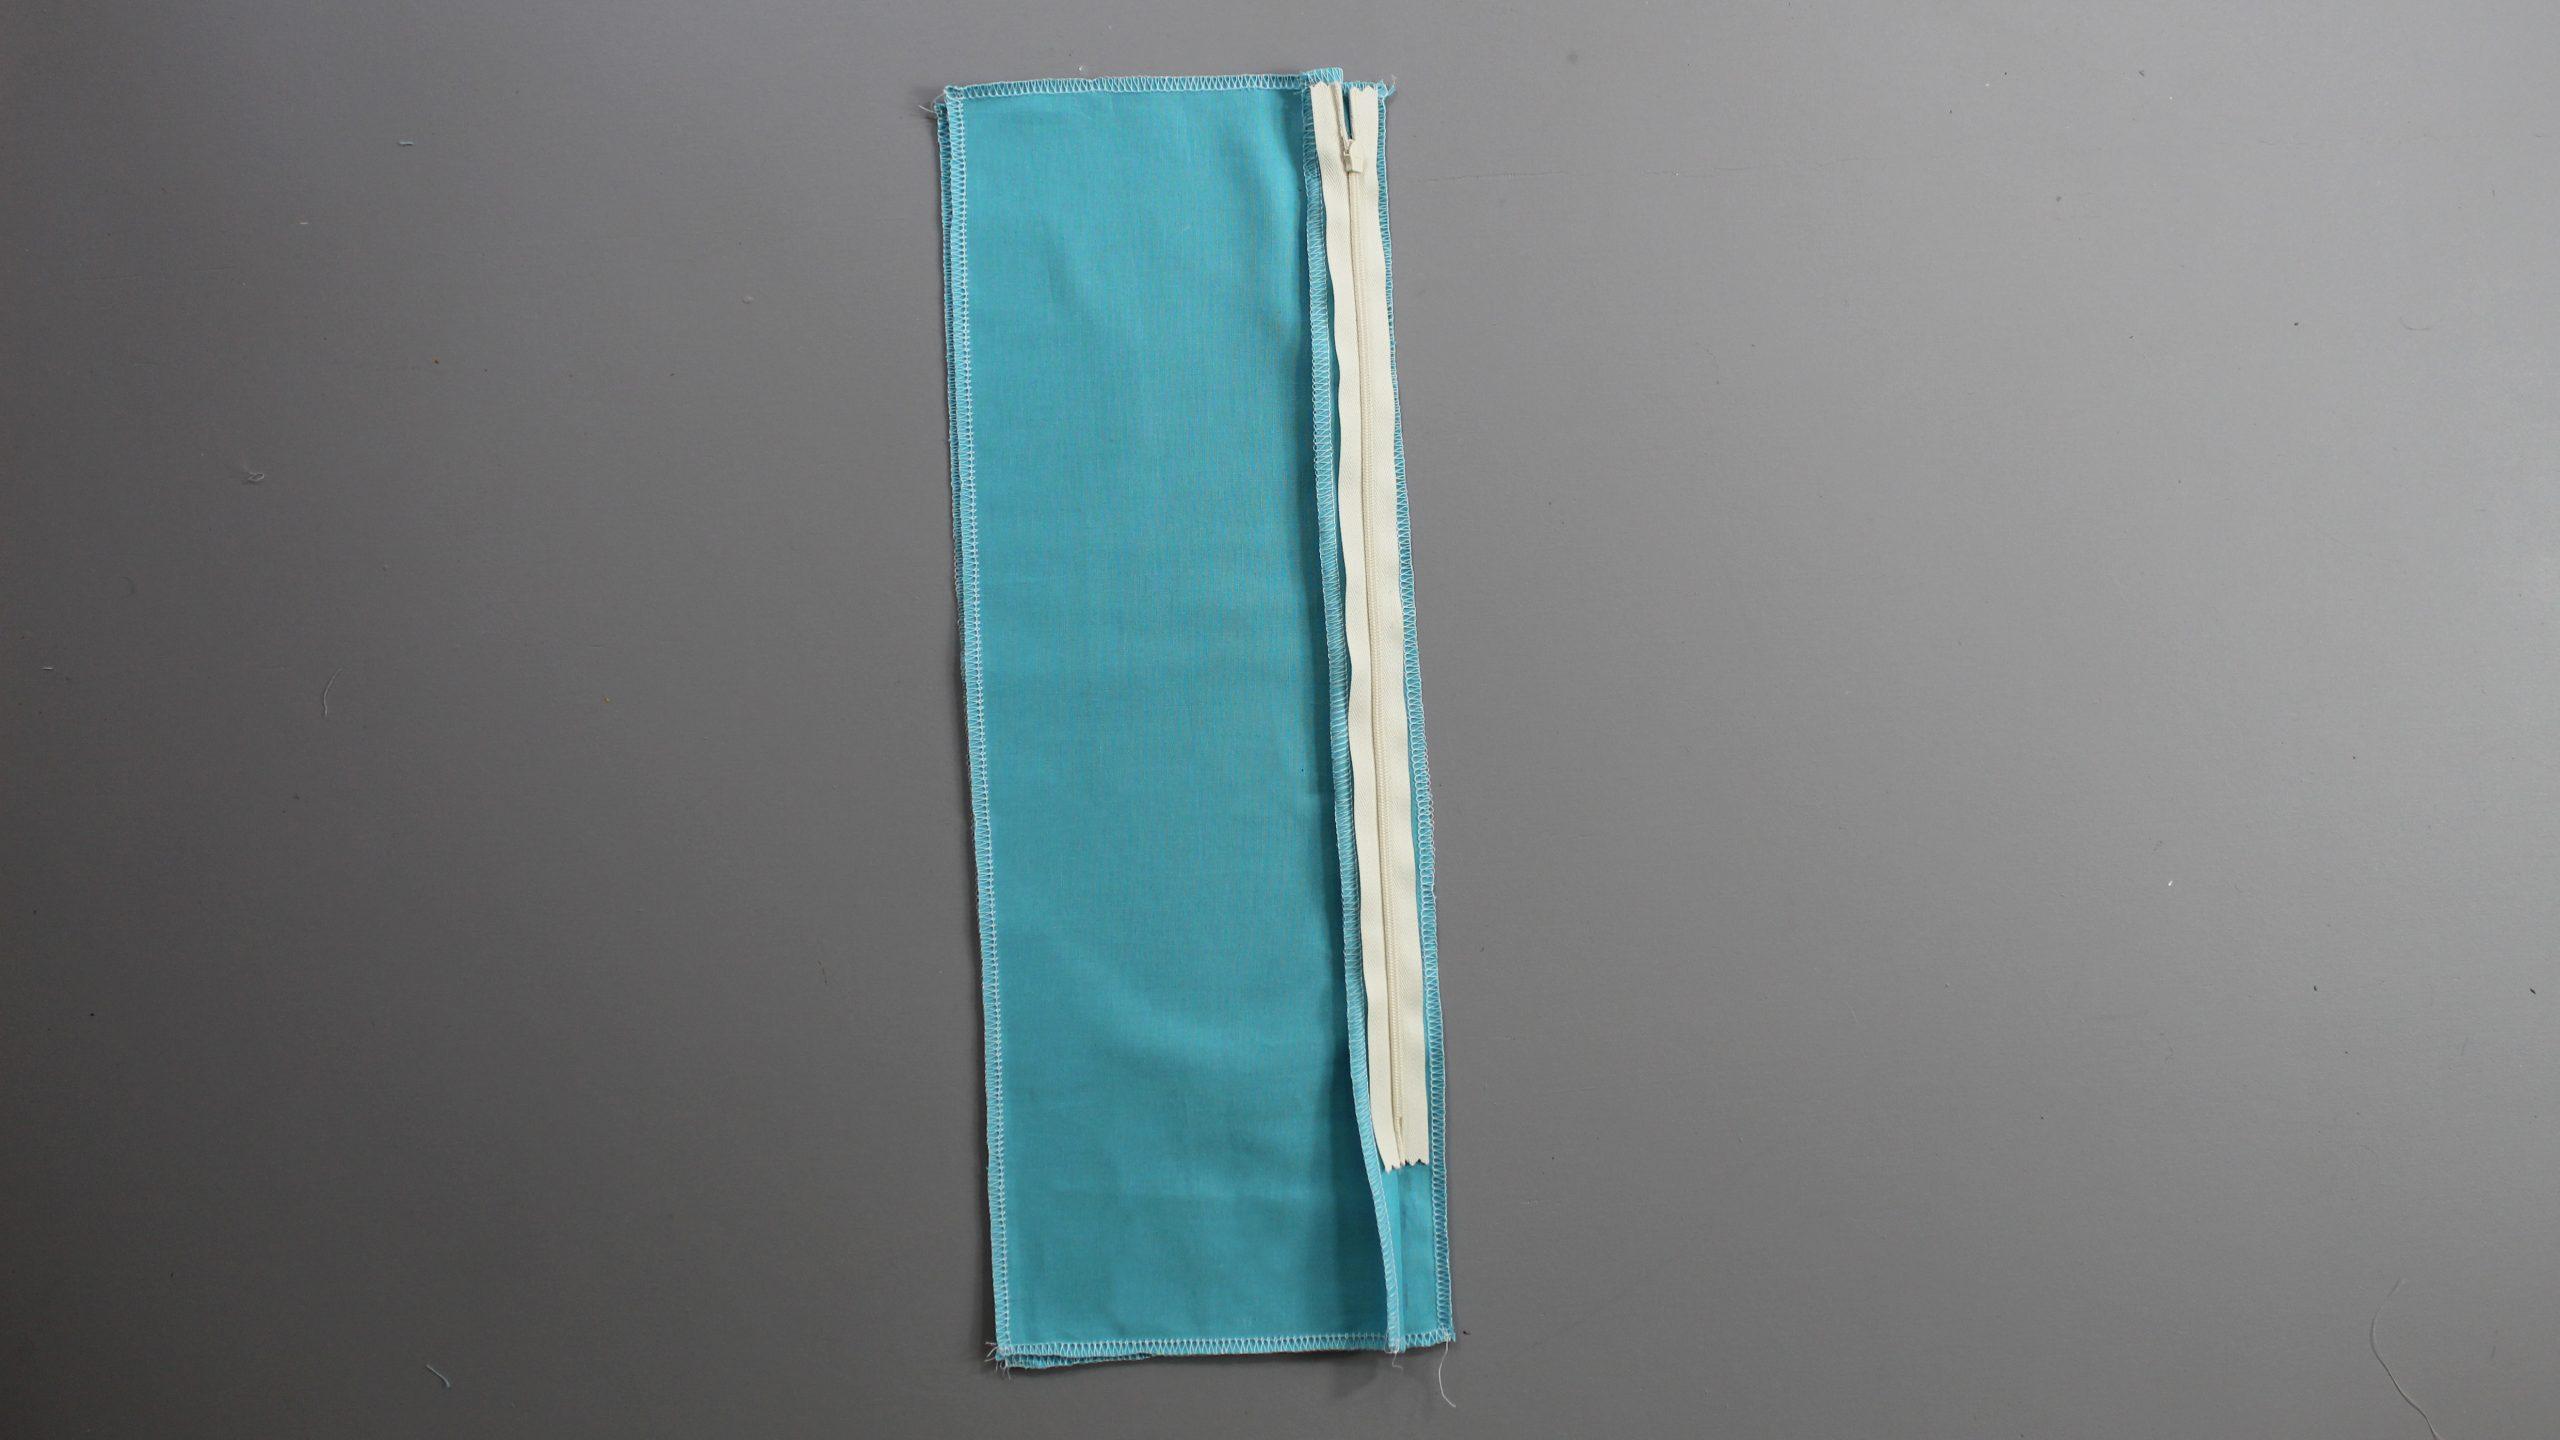 Zipper seam folded over